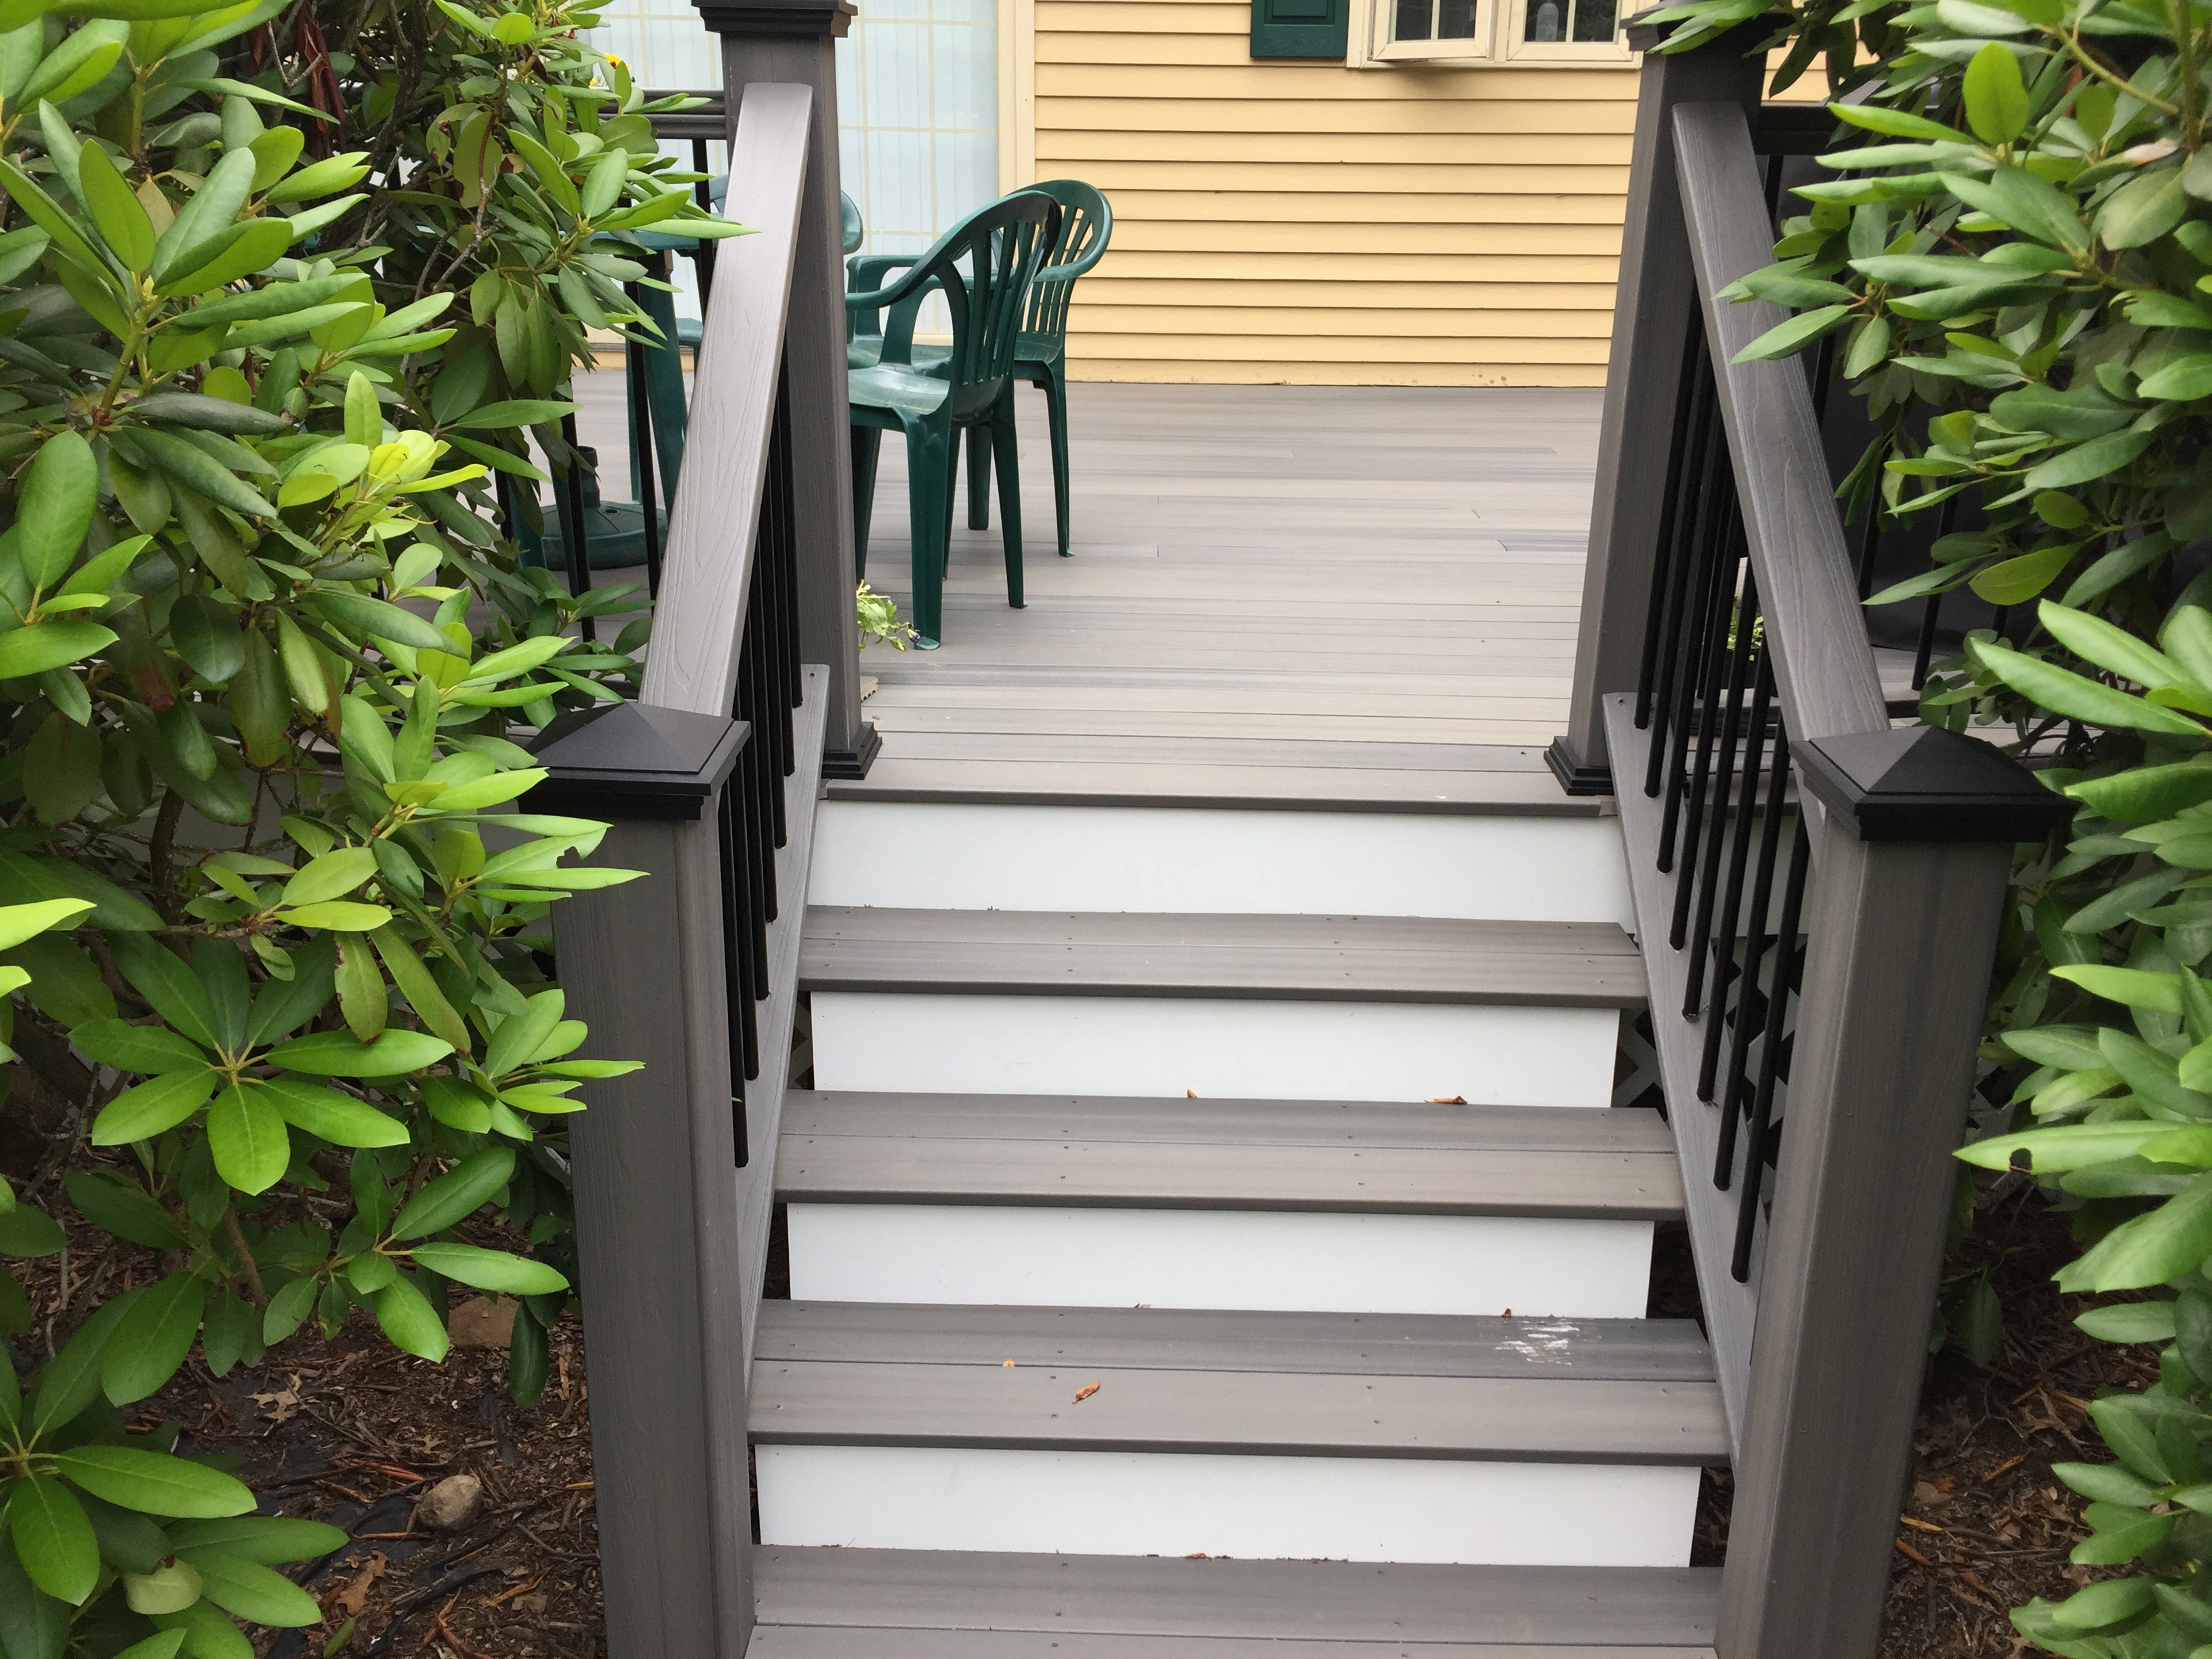 hardwood floor refinishing danbury ct of general painting primo carpentry remodeling llc with regard to deck staining 2